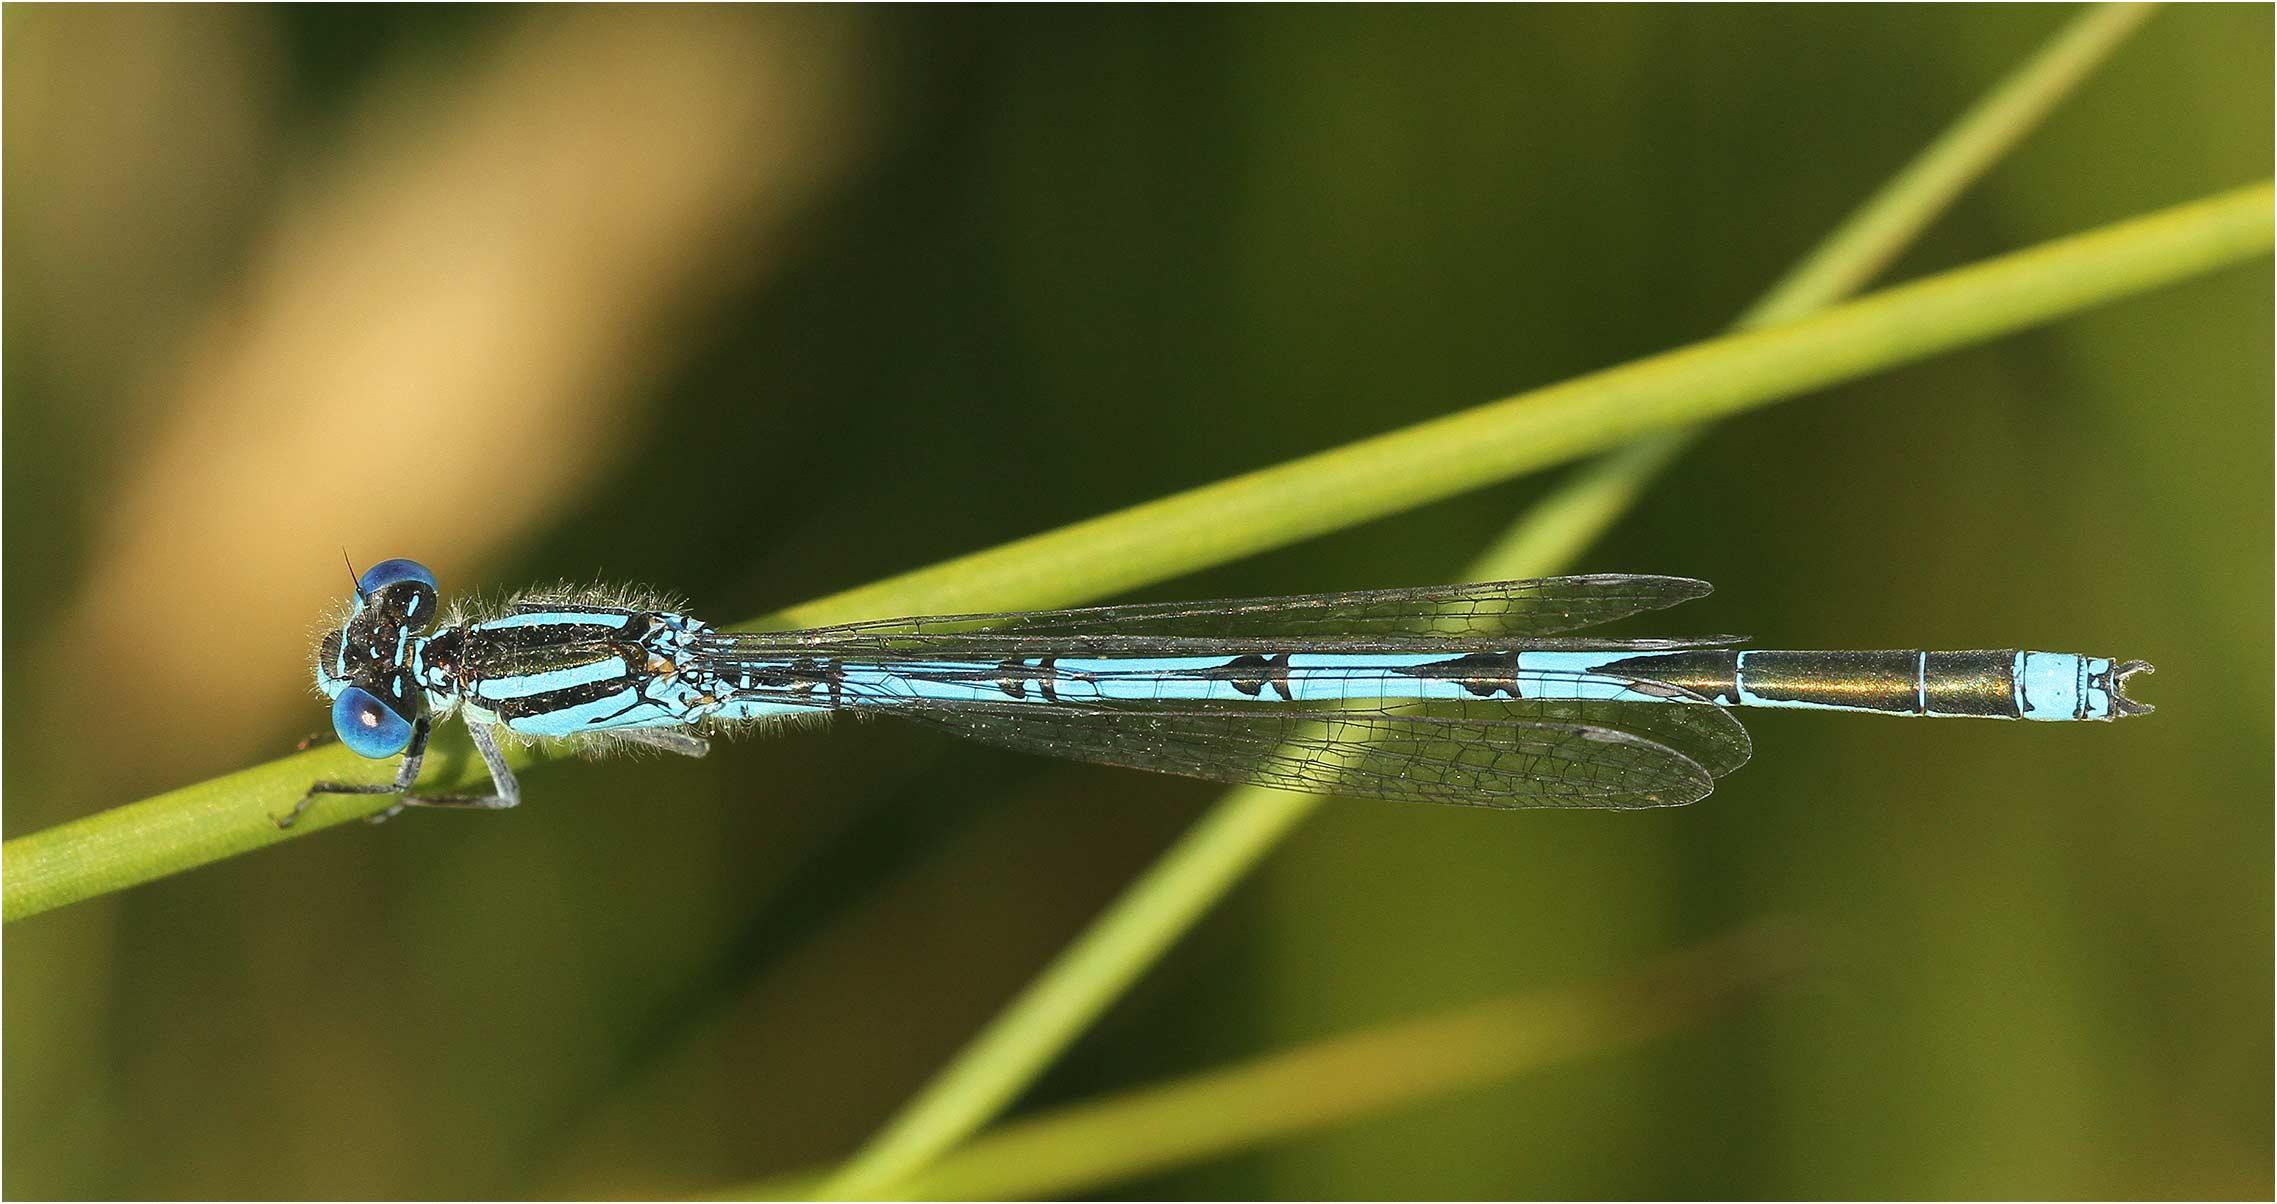 Erythromma lindenii mâle, France, Saint Quentin en Mauges, 27/06/2013